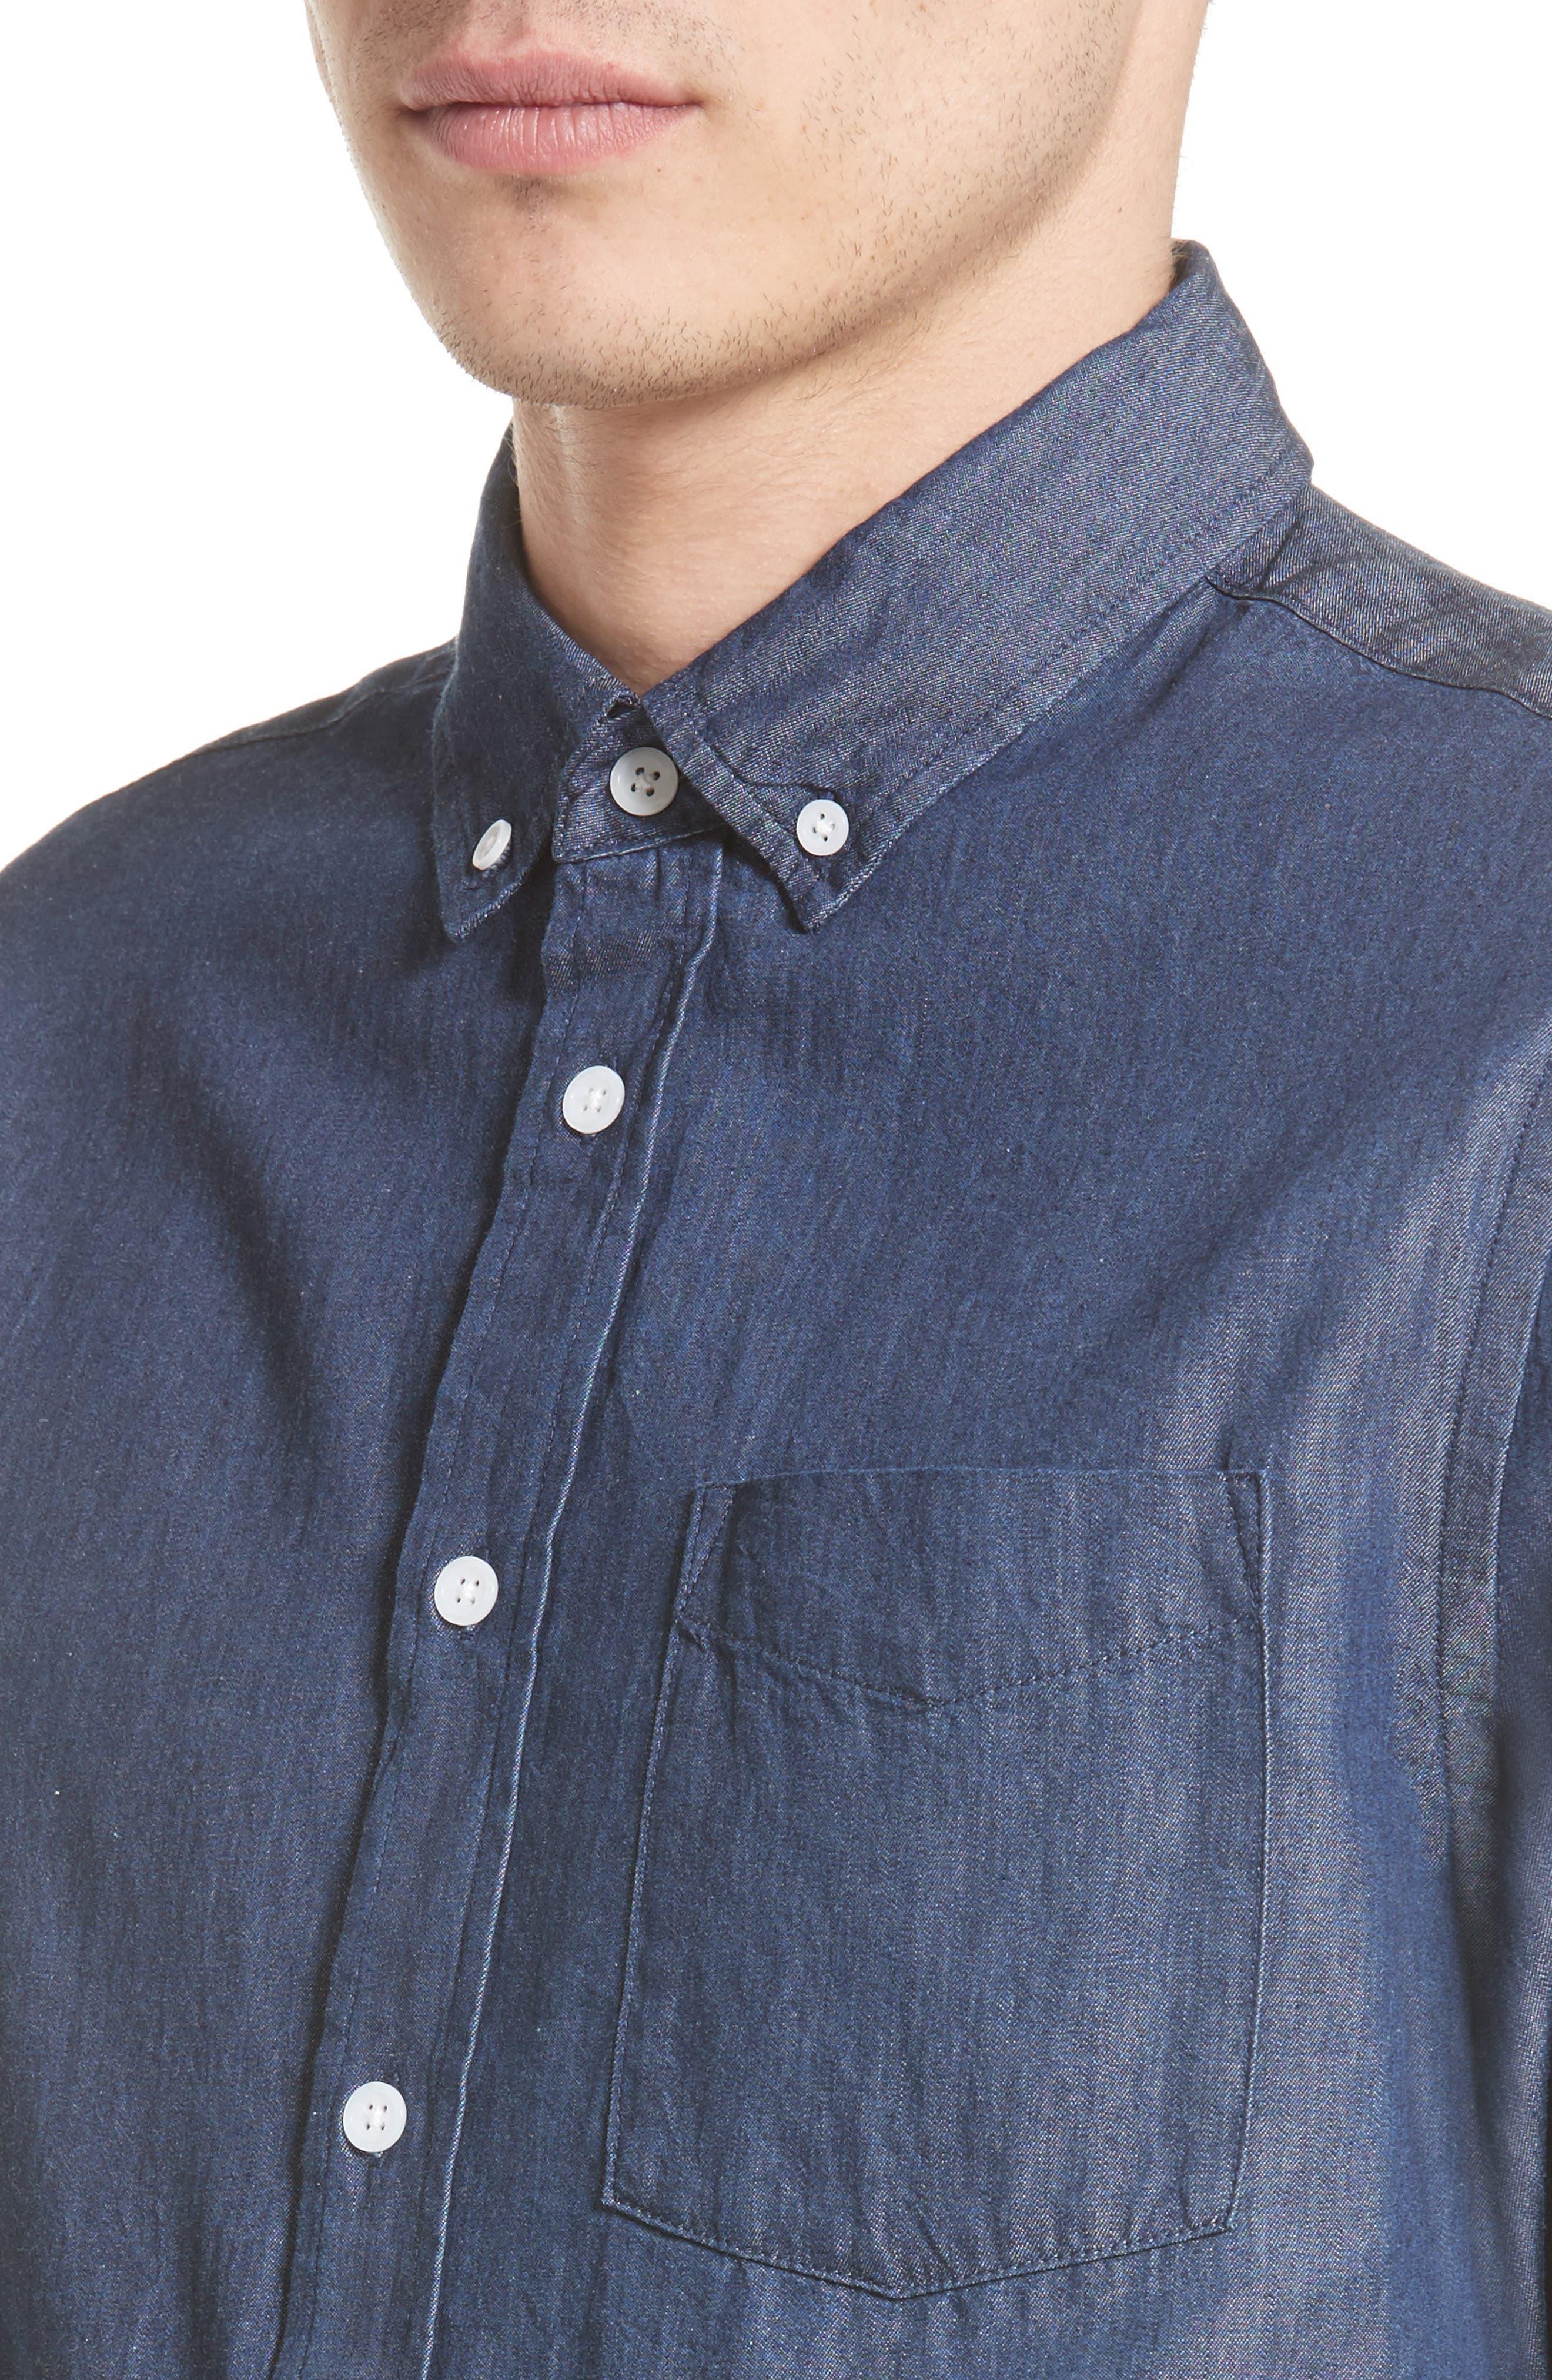 Crosby Denim Slim Fit Sport Shirt,                             Alternate thumbnail 5, color,                             INDIGO